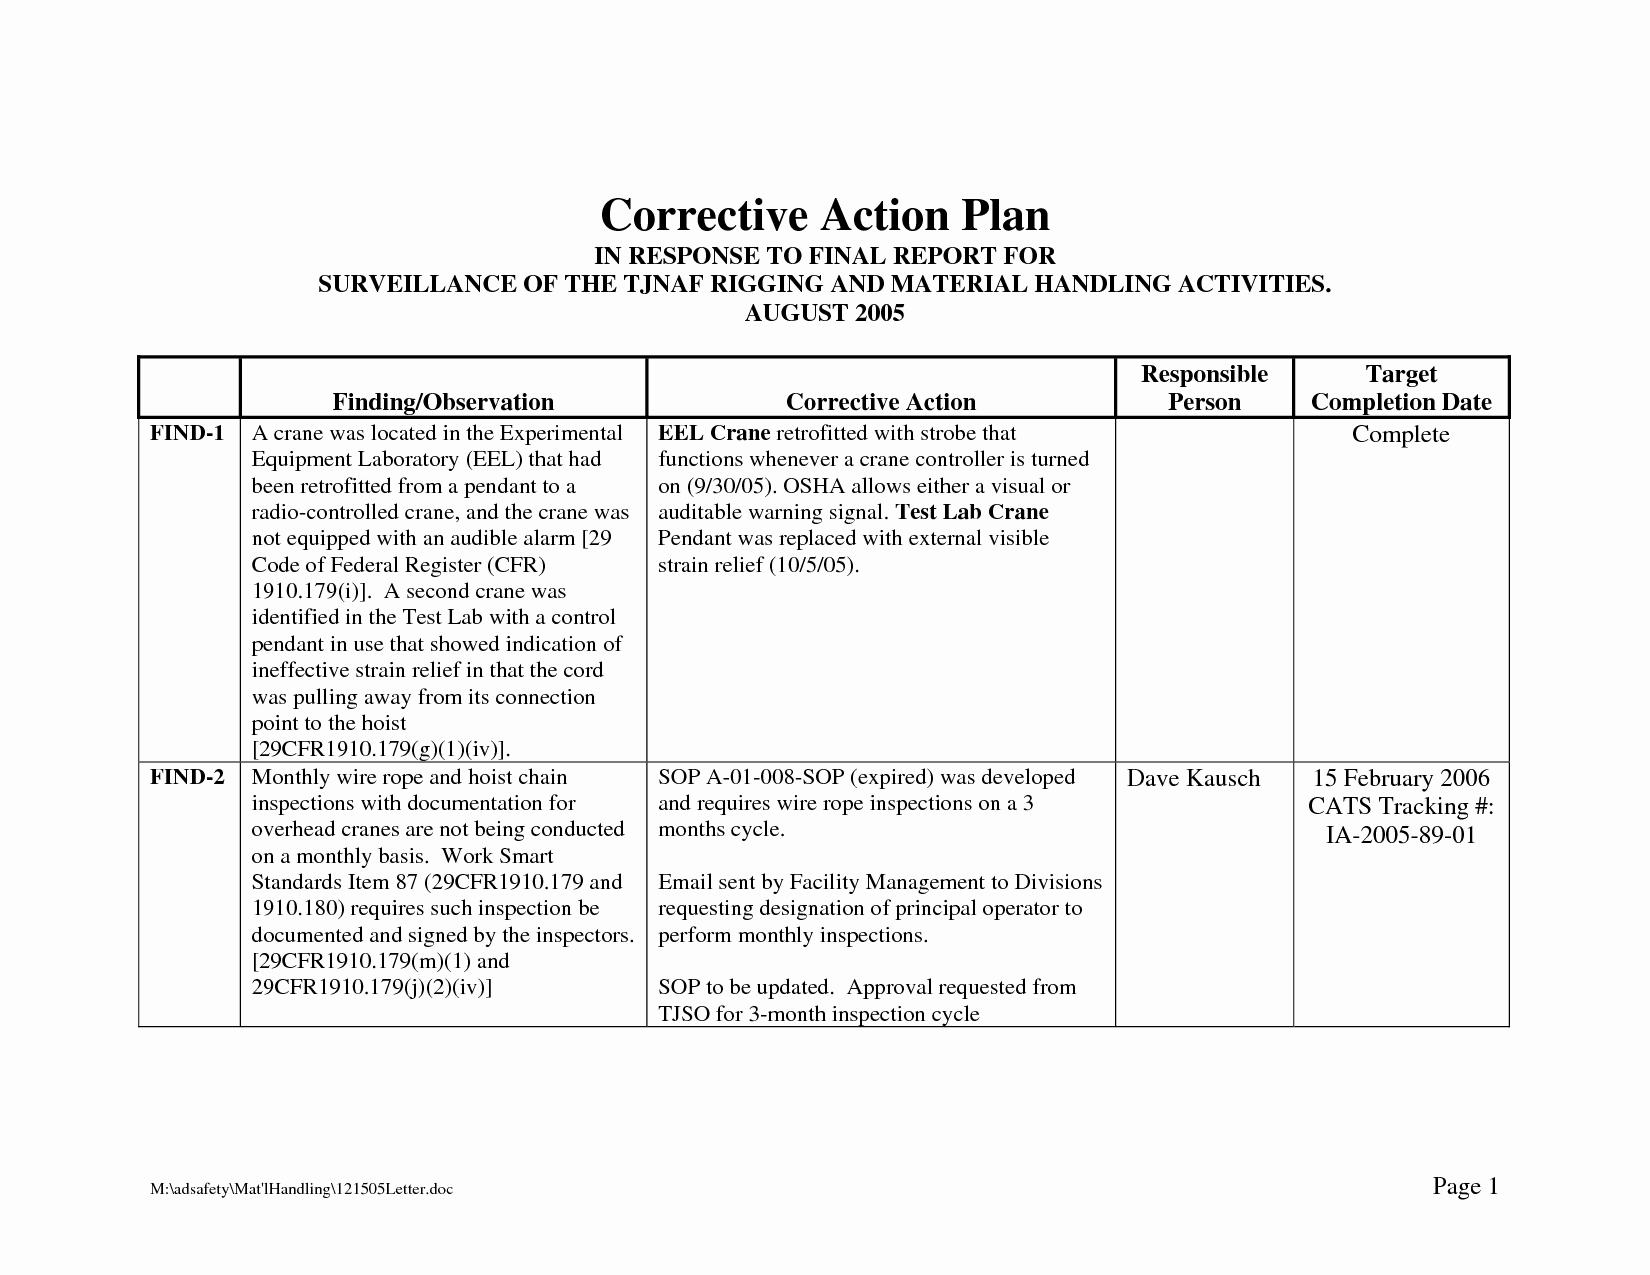 Employee Corrective Action Plan Template Beautiful Corrective Action Plan